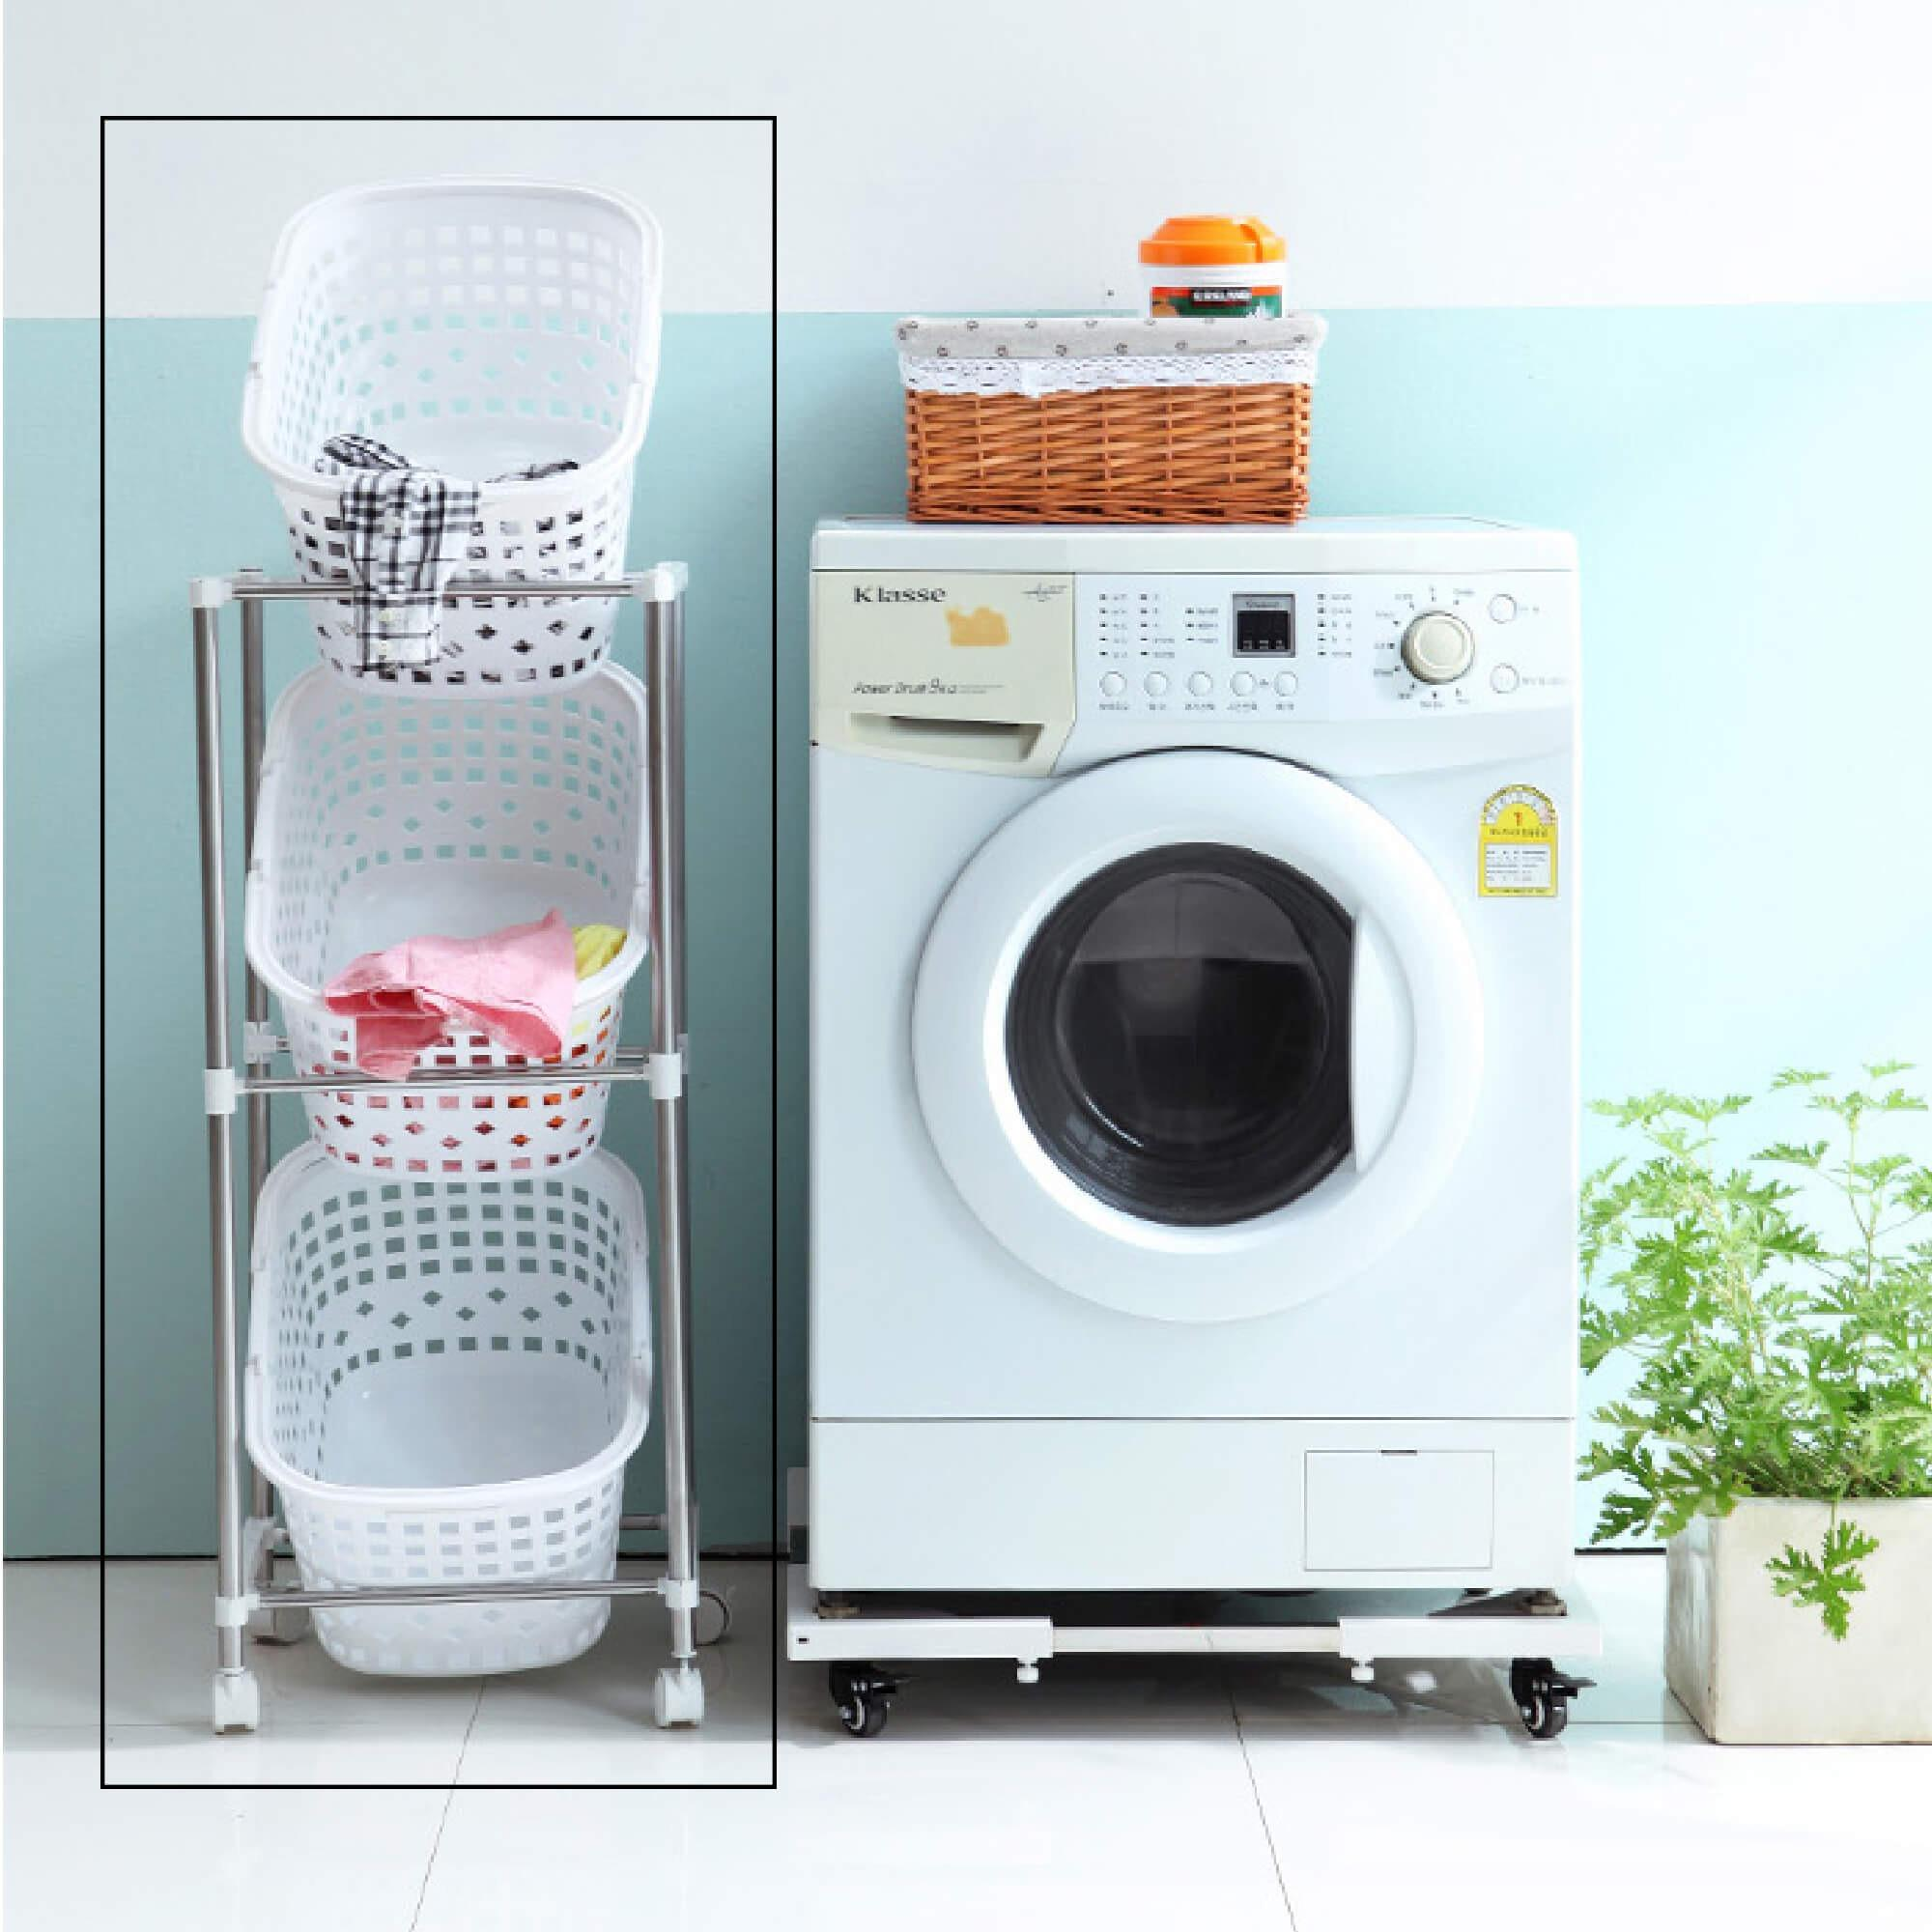 Harga Spesifikasi The Olive House Gantungan Baju 22 Putih Terbaru Lemari Jasmine 9 Susun Mahogany Laundry Basket 3t